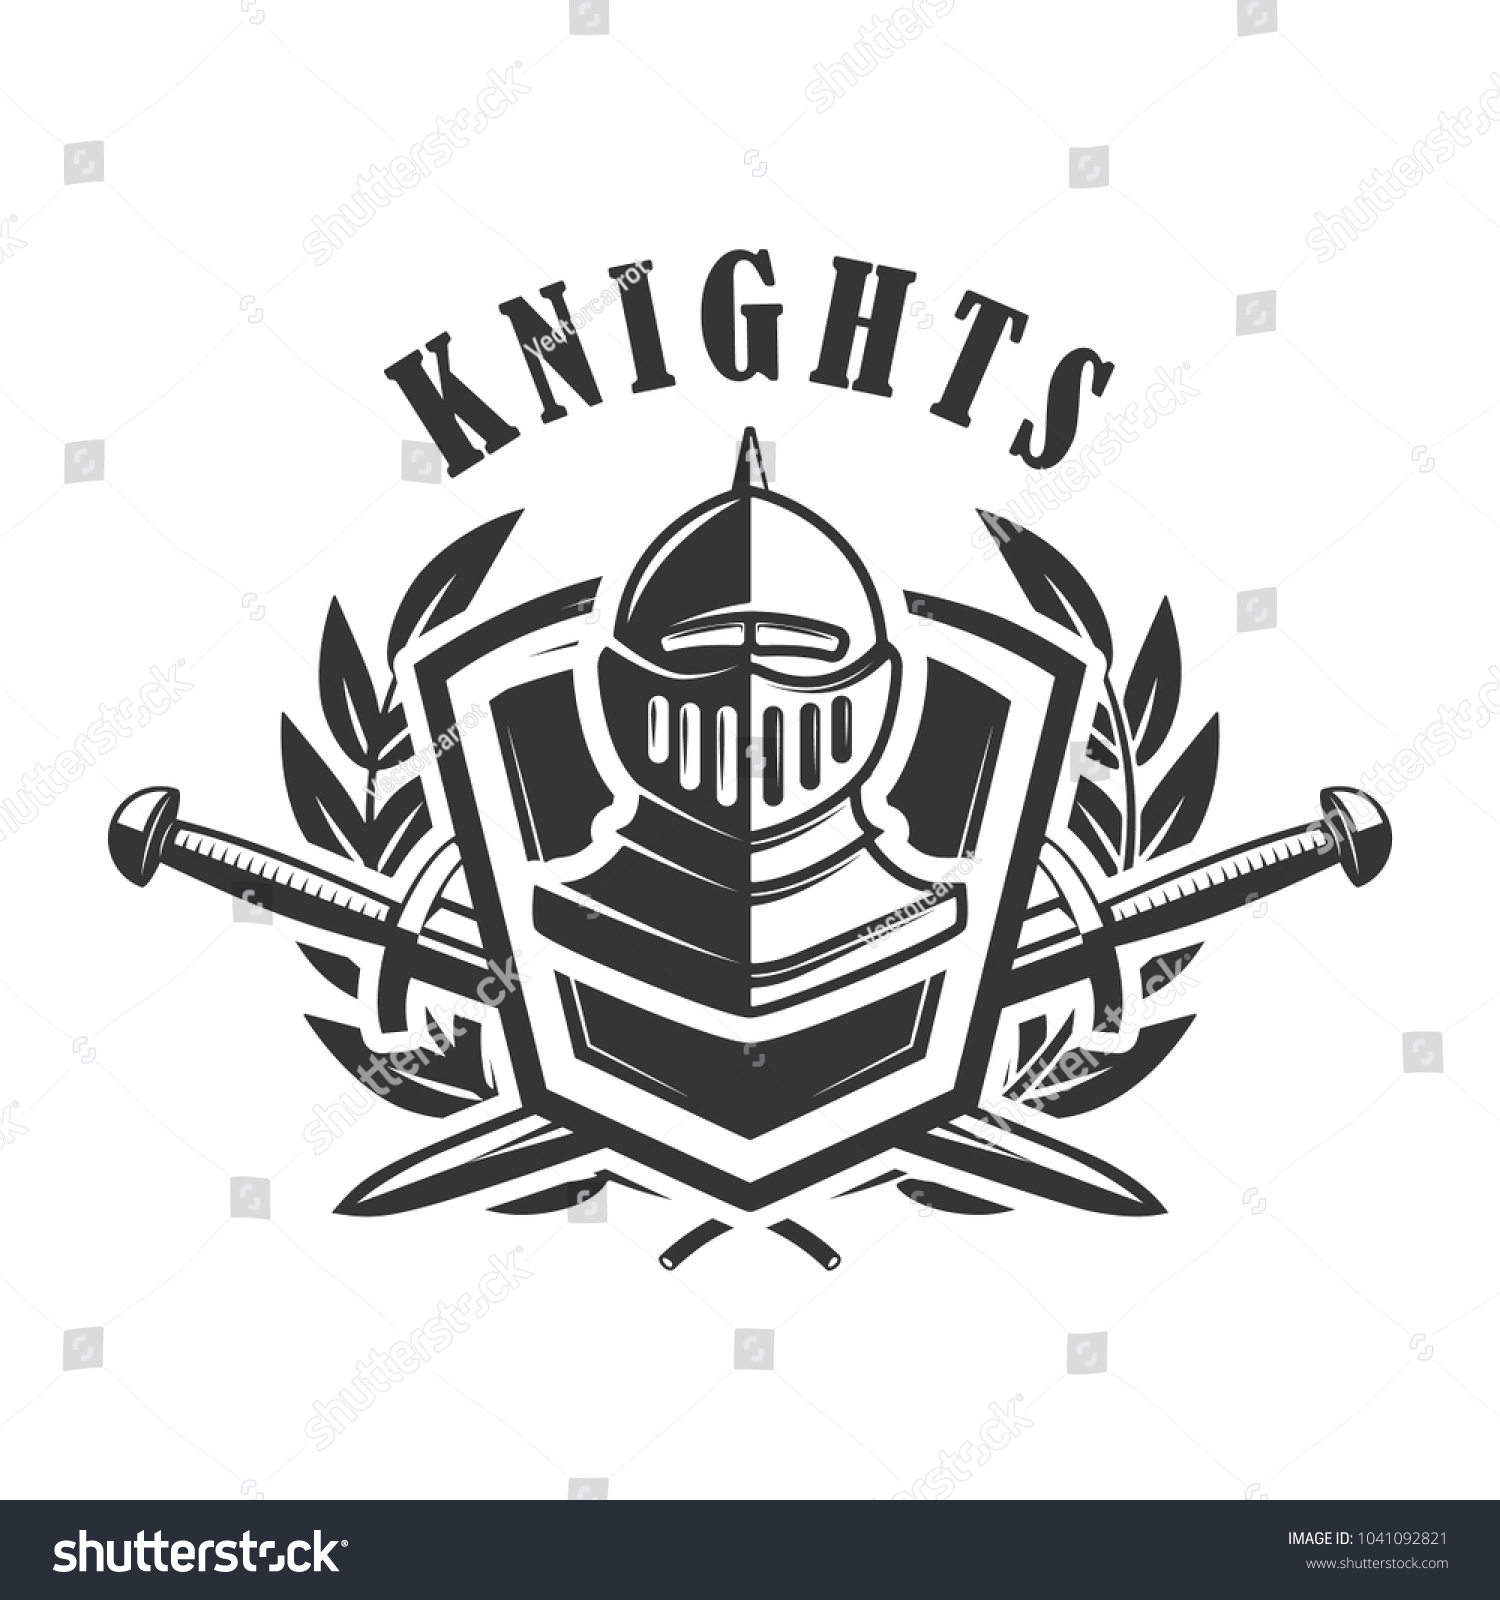 knights emblem template medieval knight helmet のベクター画像素材